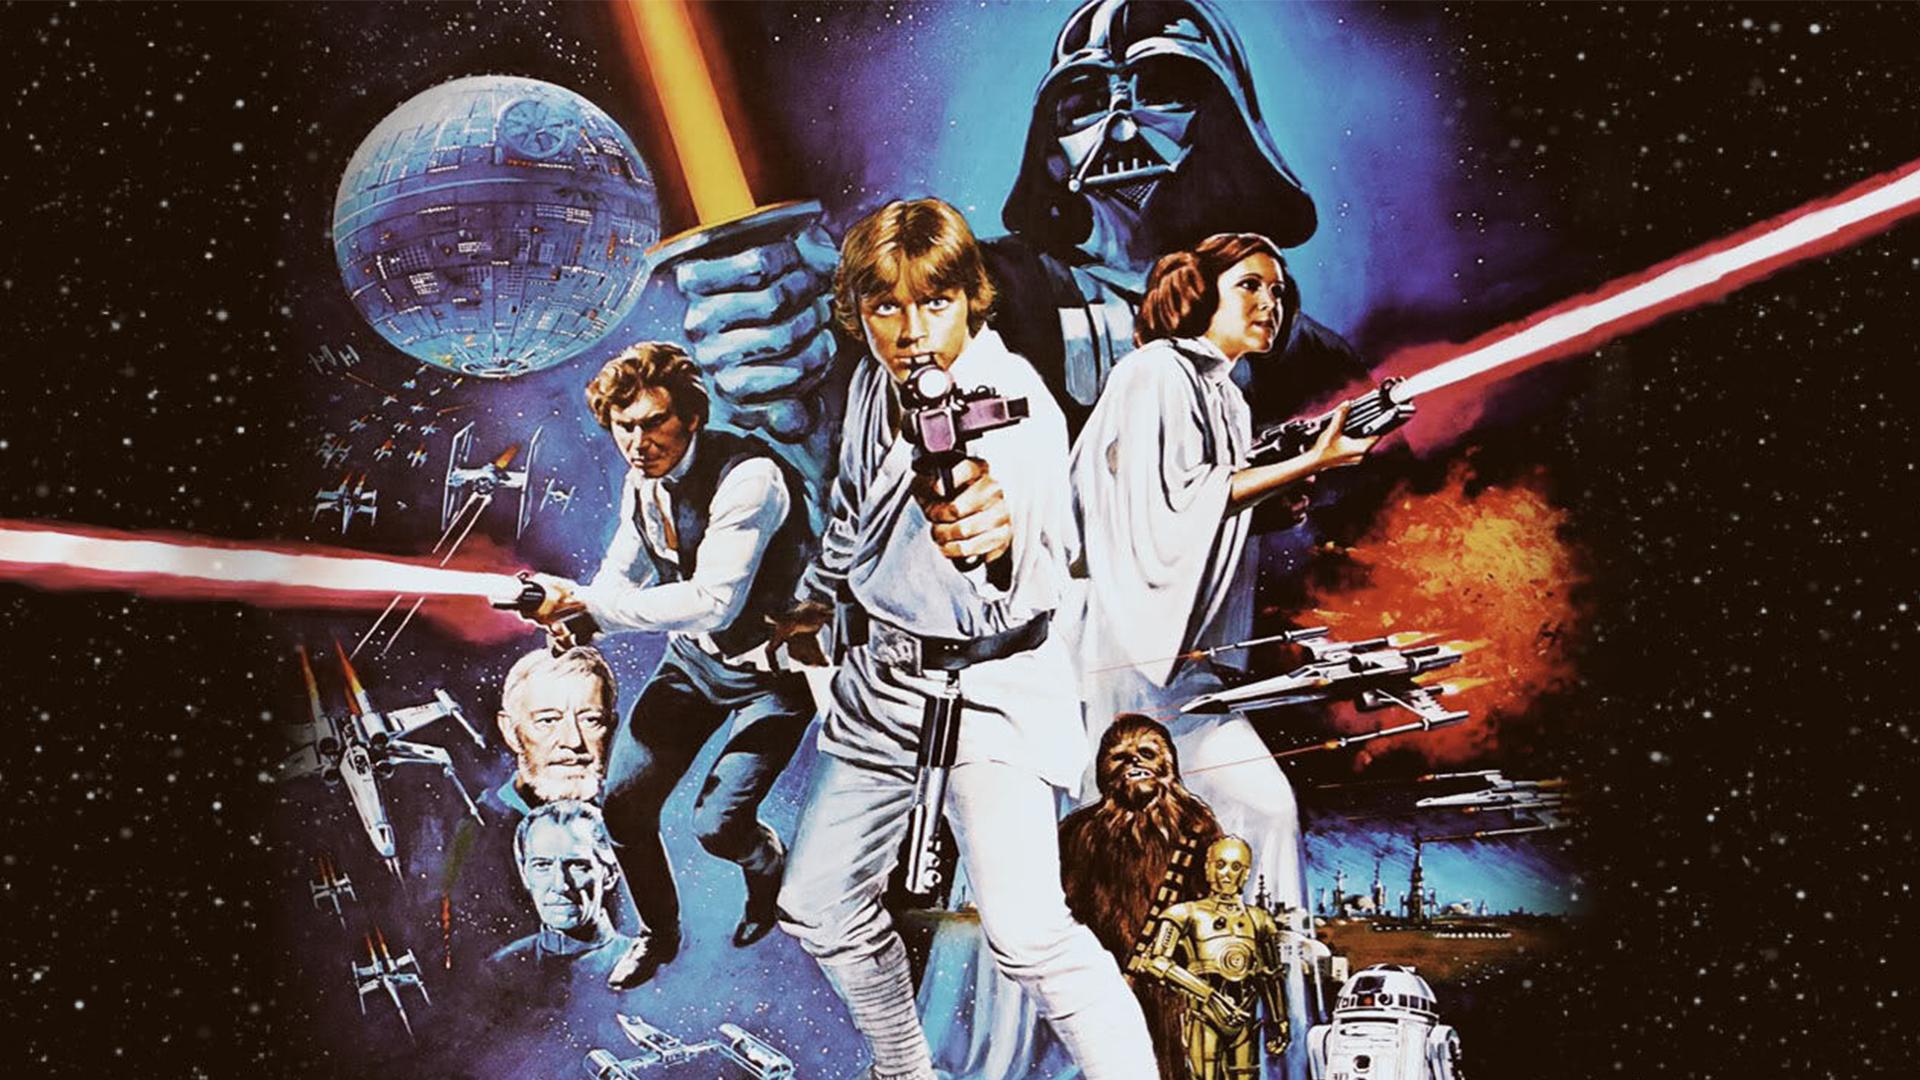 star wars (trilogia antiga)